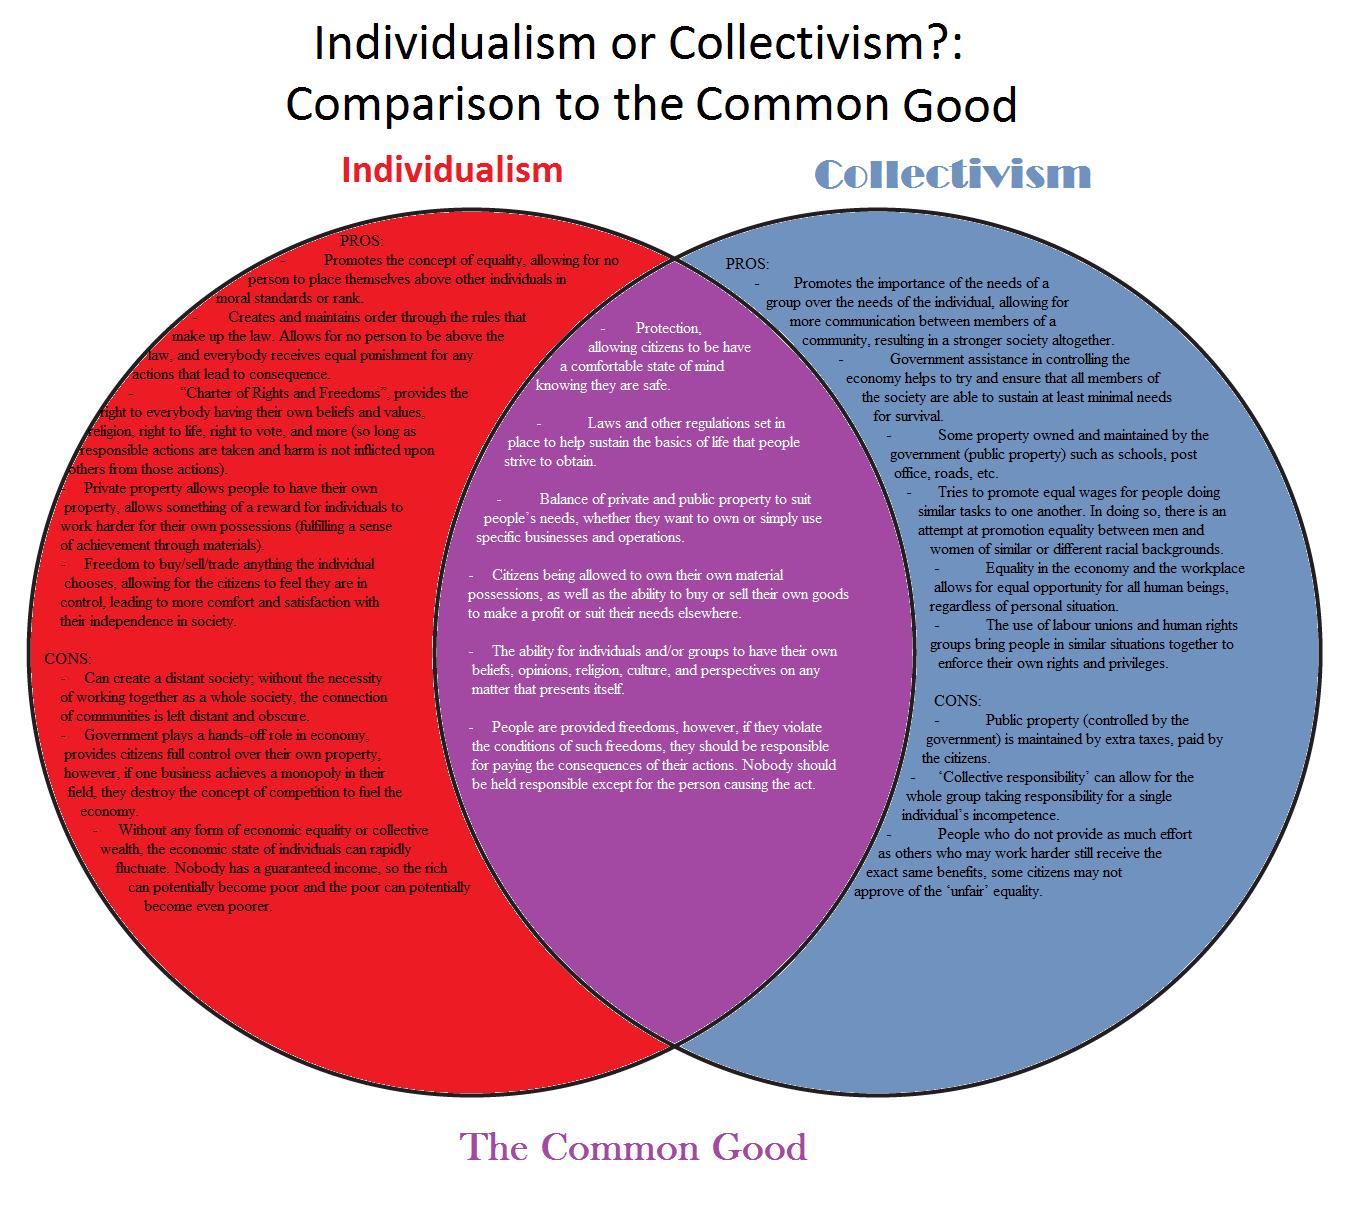 socialism and capitalism venn diagram gould century electric motor wiring communism vs traffic club videos pronk palisades